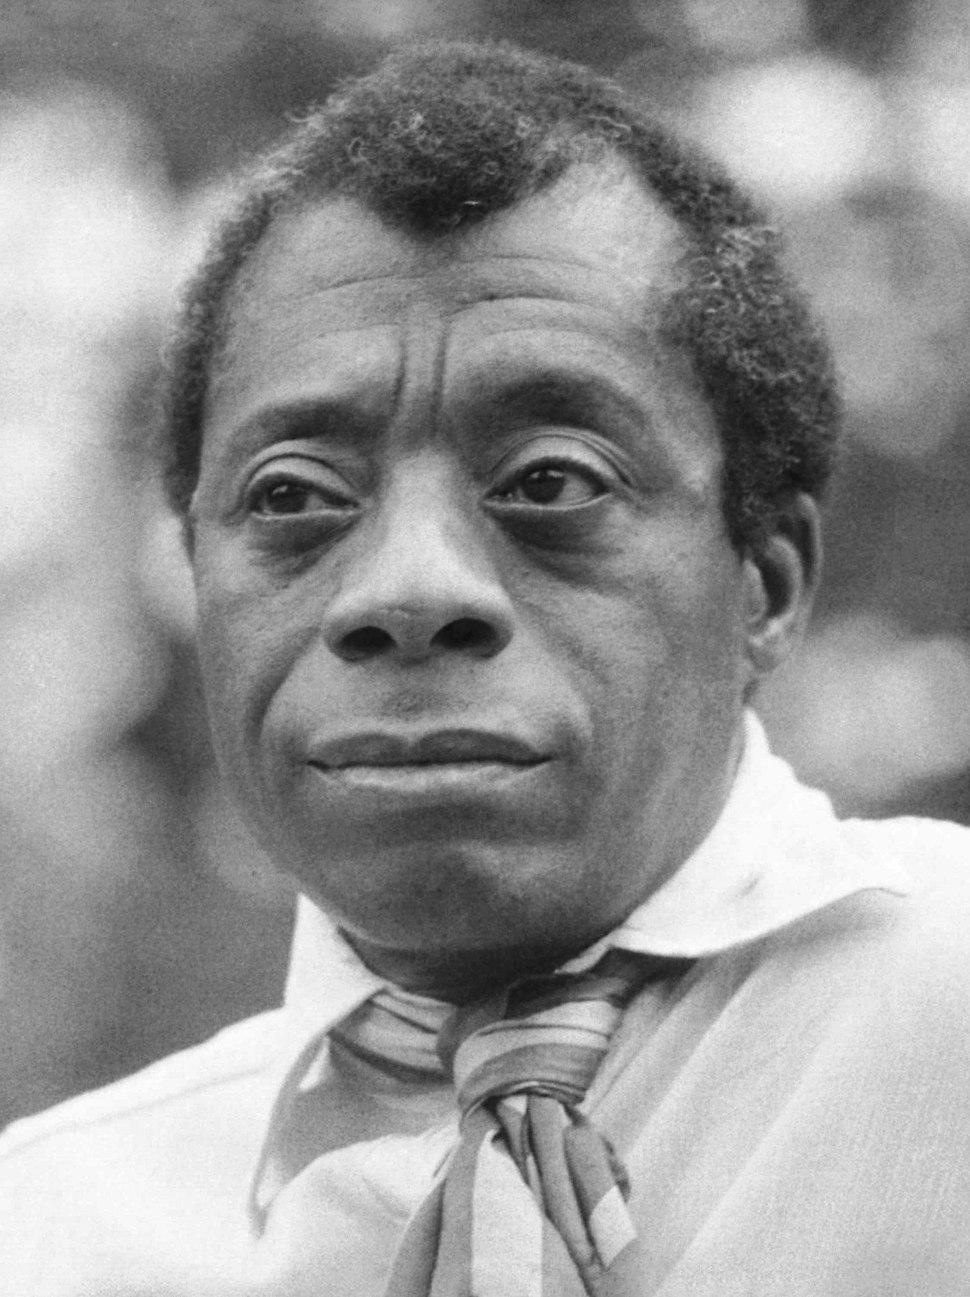 James Baldwin 37 Allan Warren (cropped)